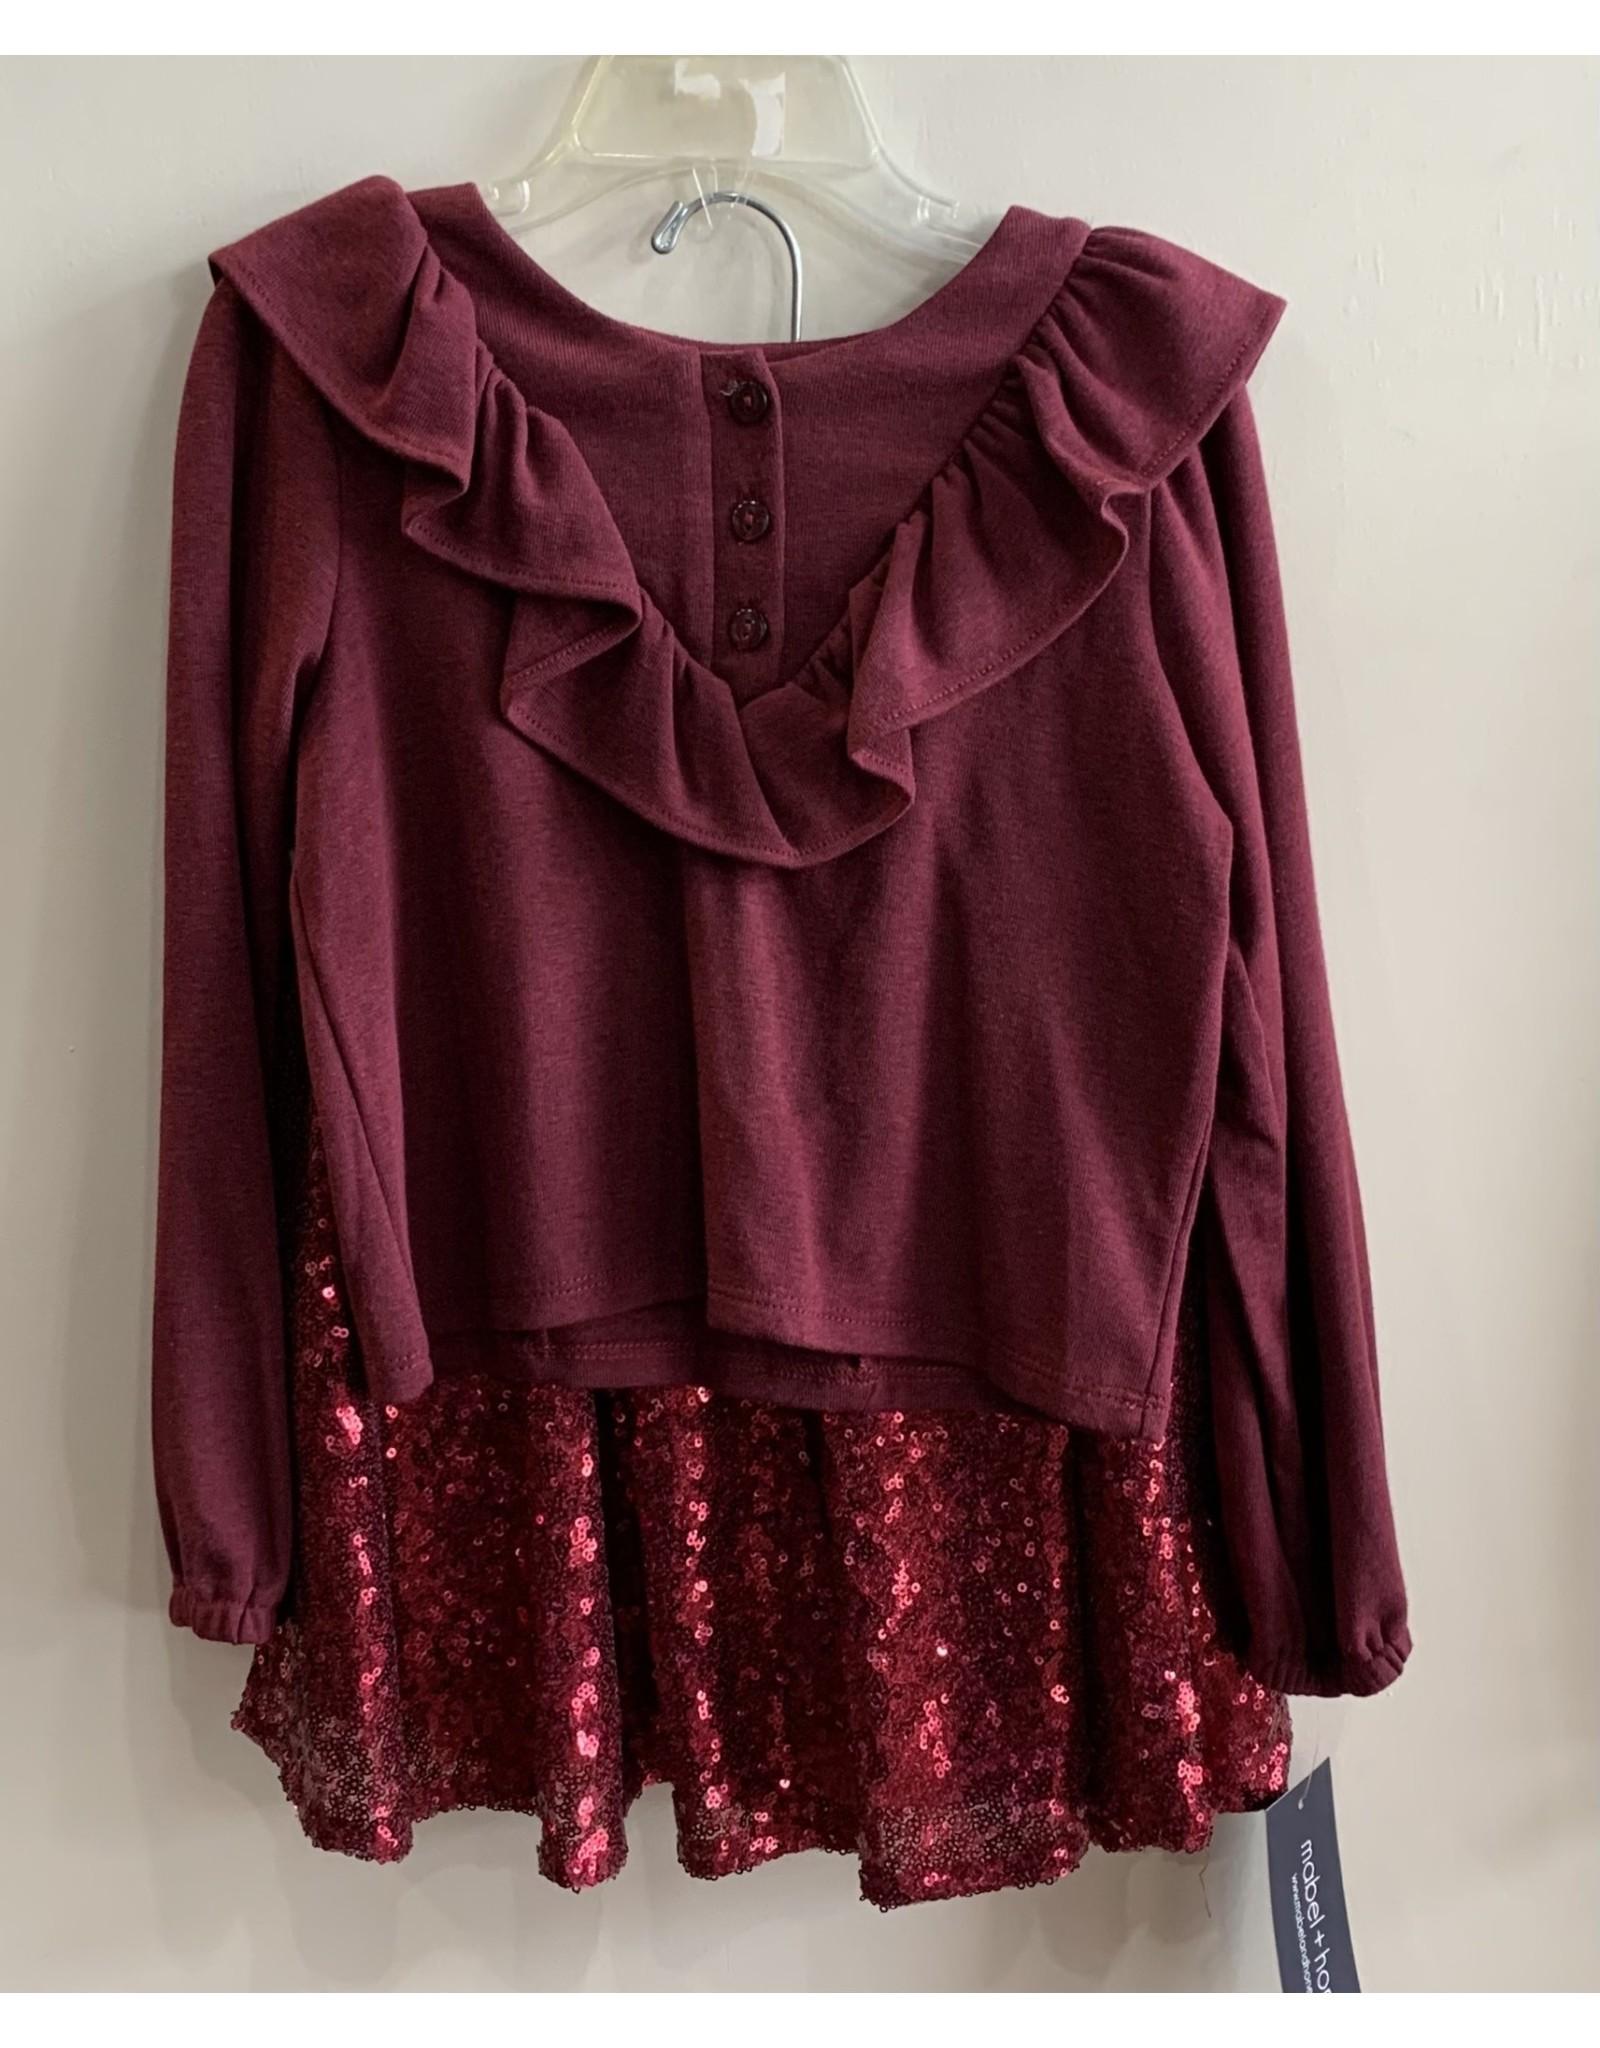 Mabel & Honey M & H- Dazzling Fireflies Dress- Burgundy